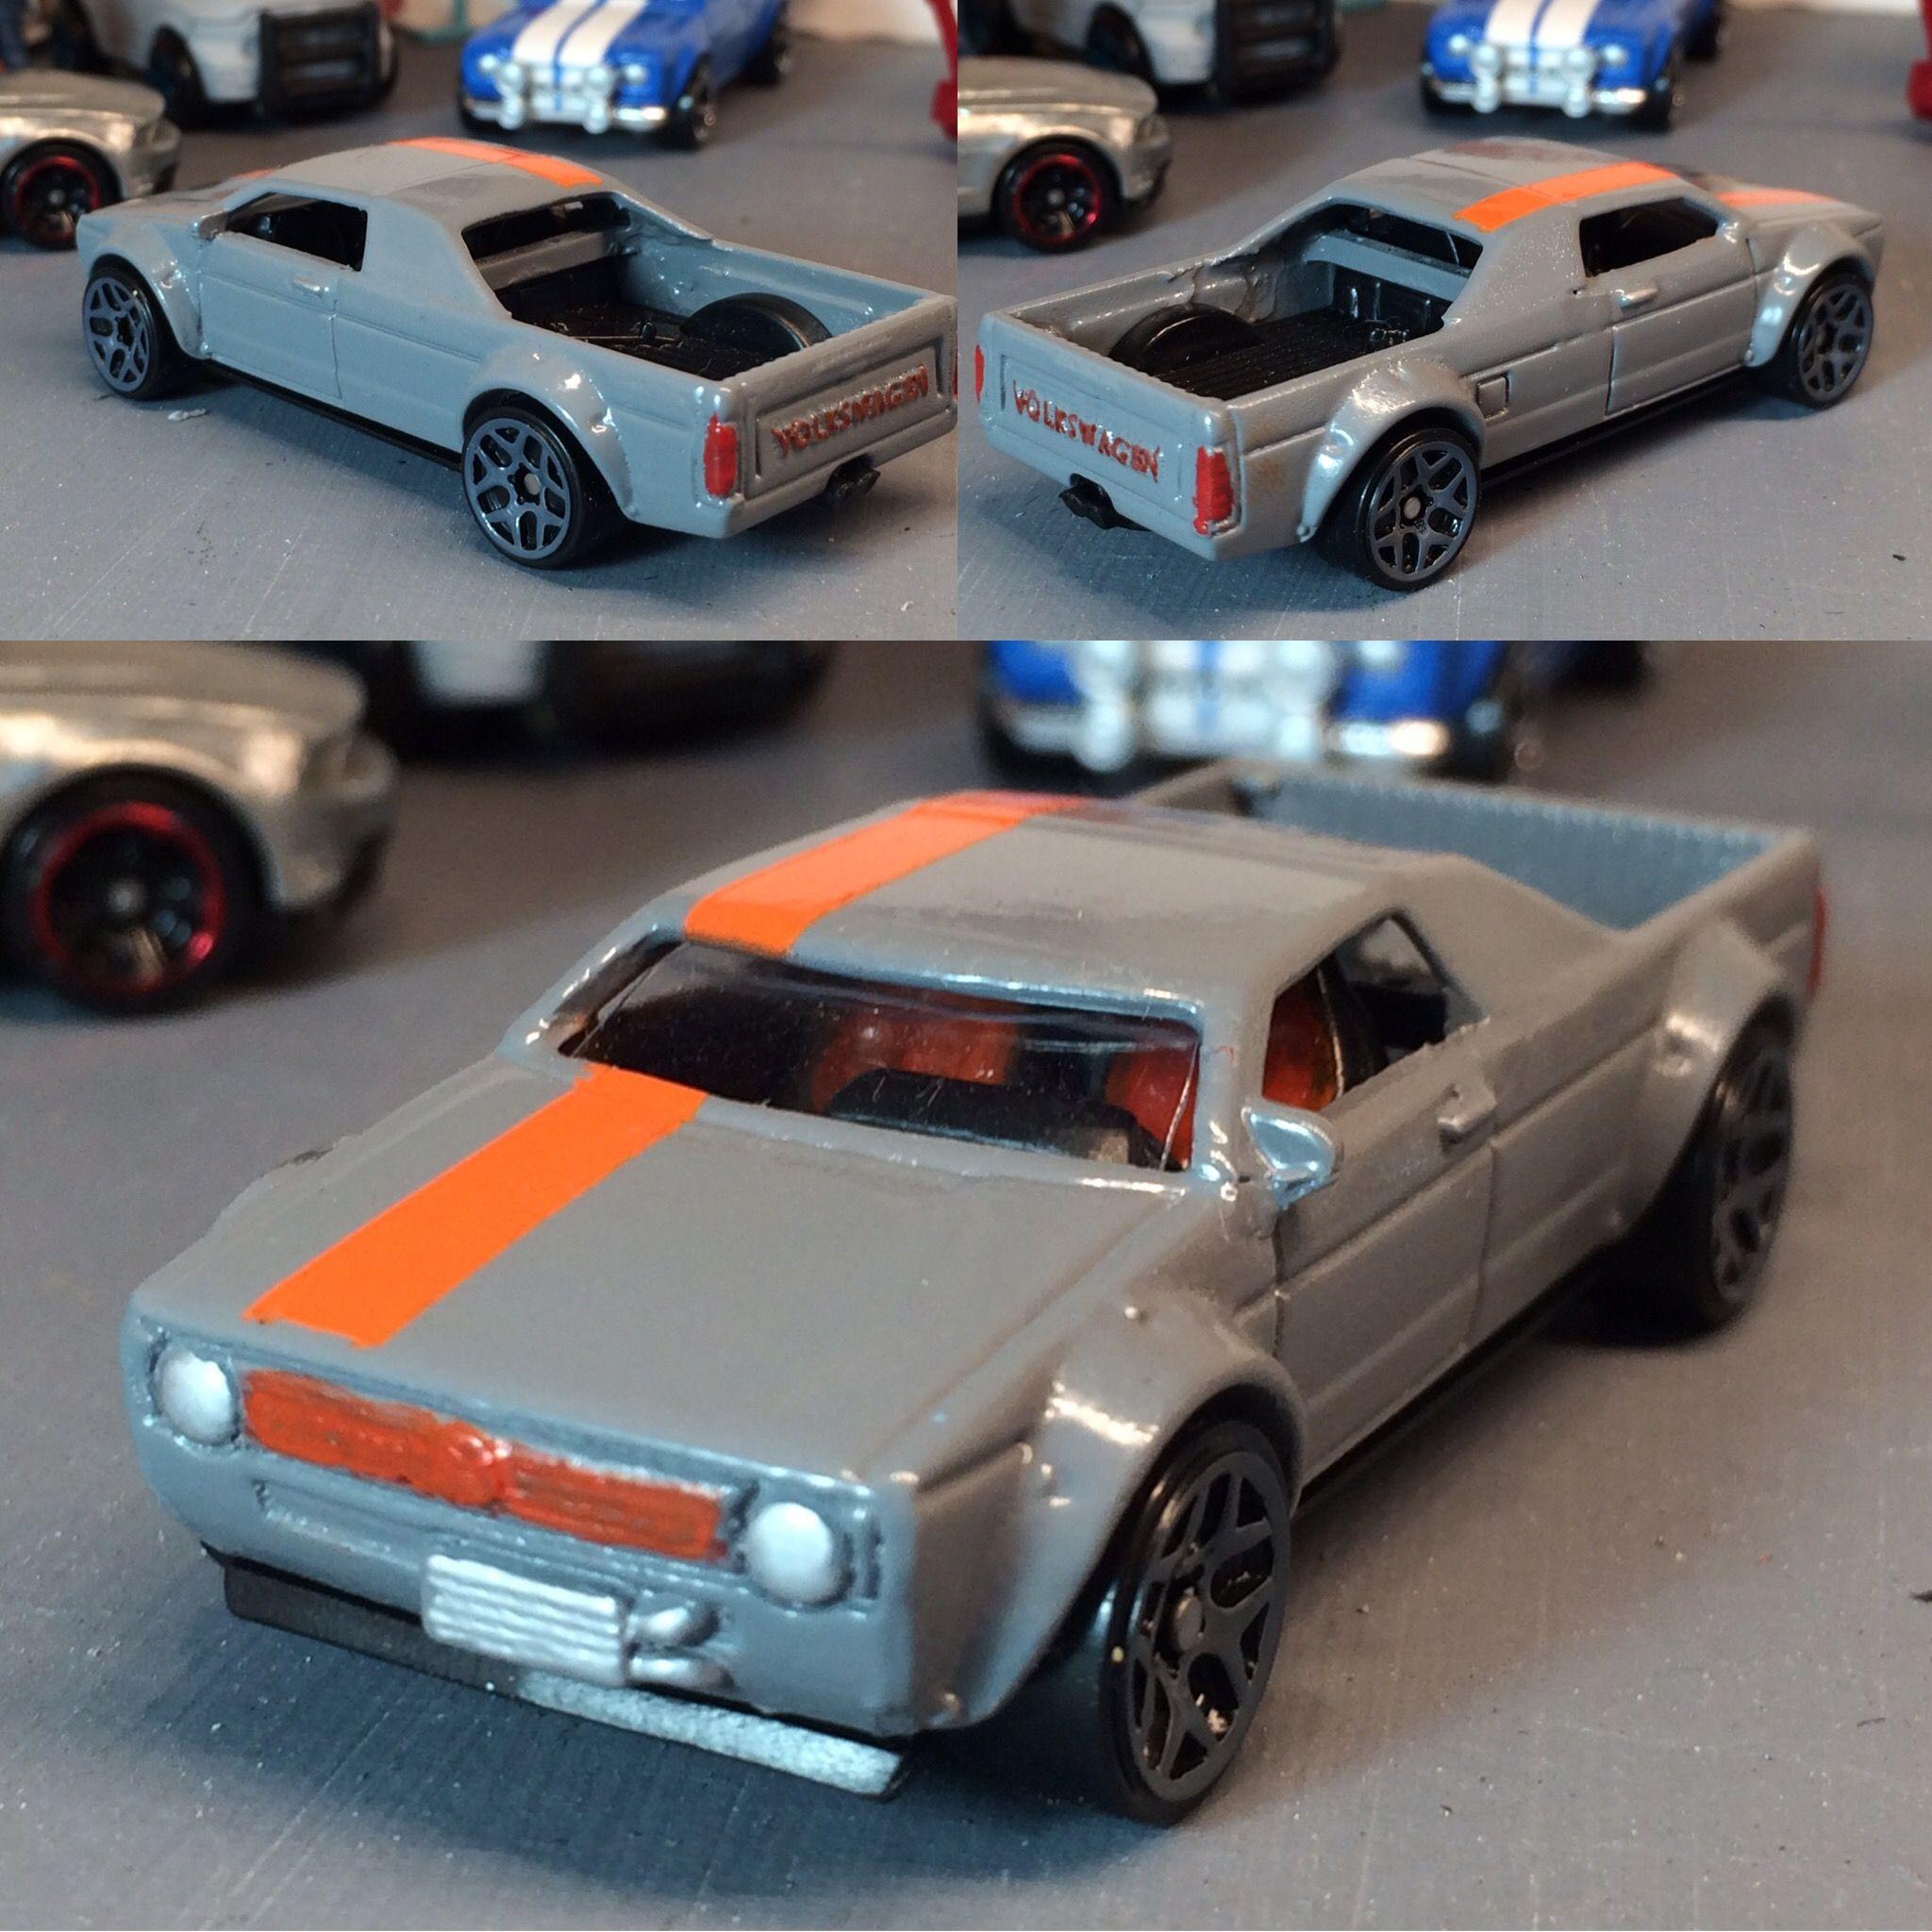 custom vw caddy hotrod diecast customs 1 64 scale. Black Bedroom Furniture Sets. Home Design Ideas